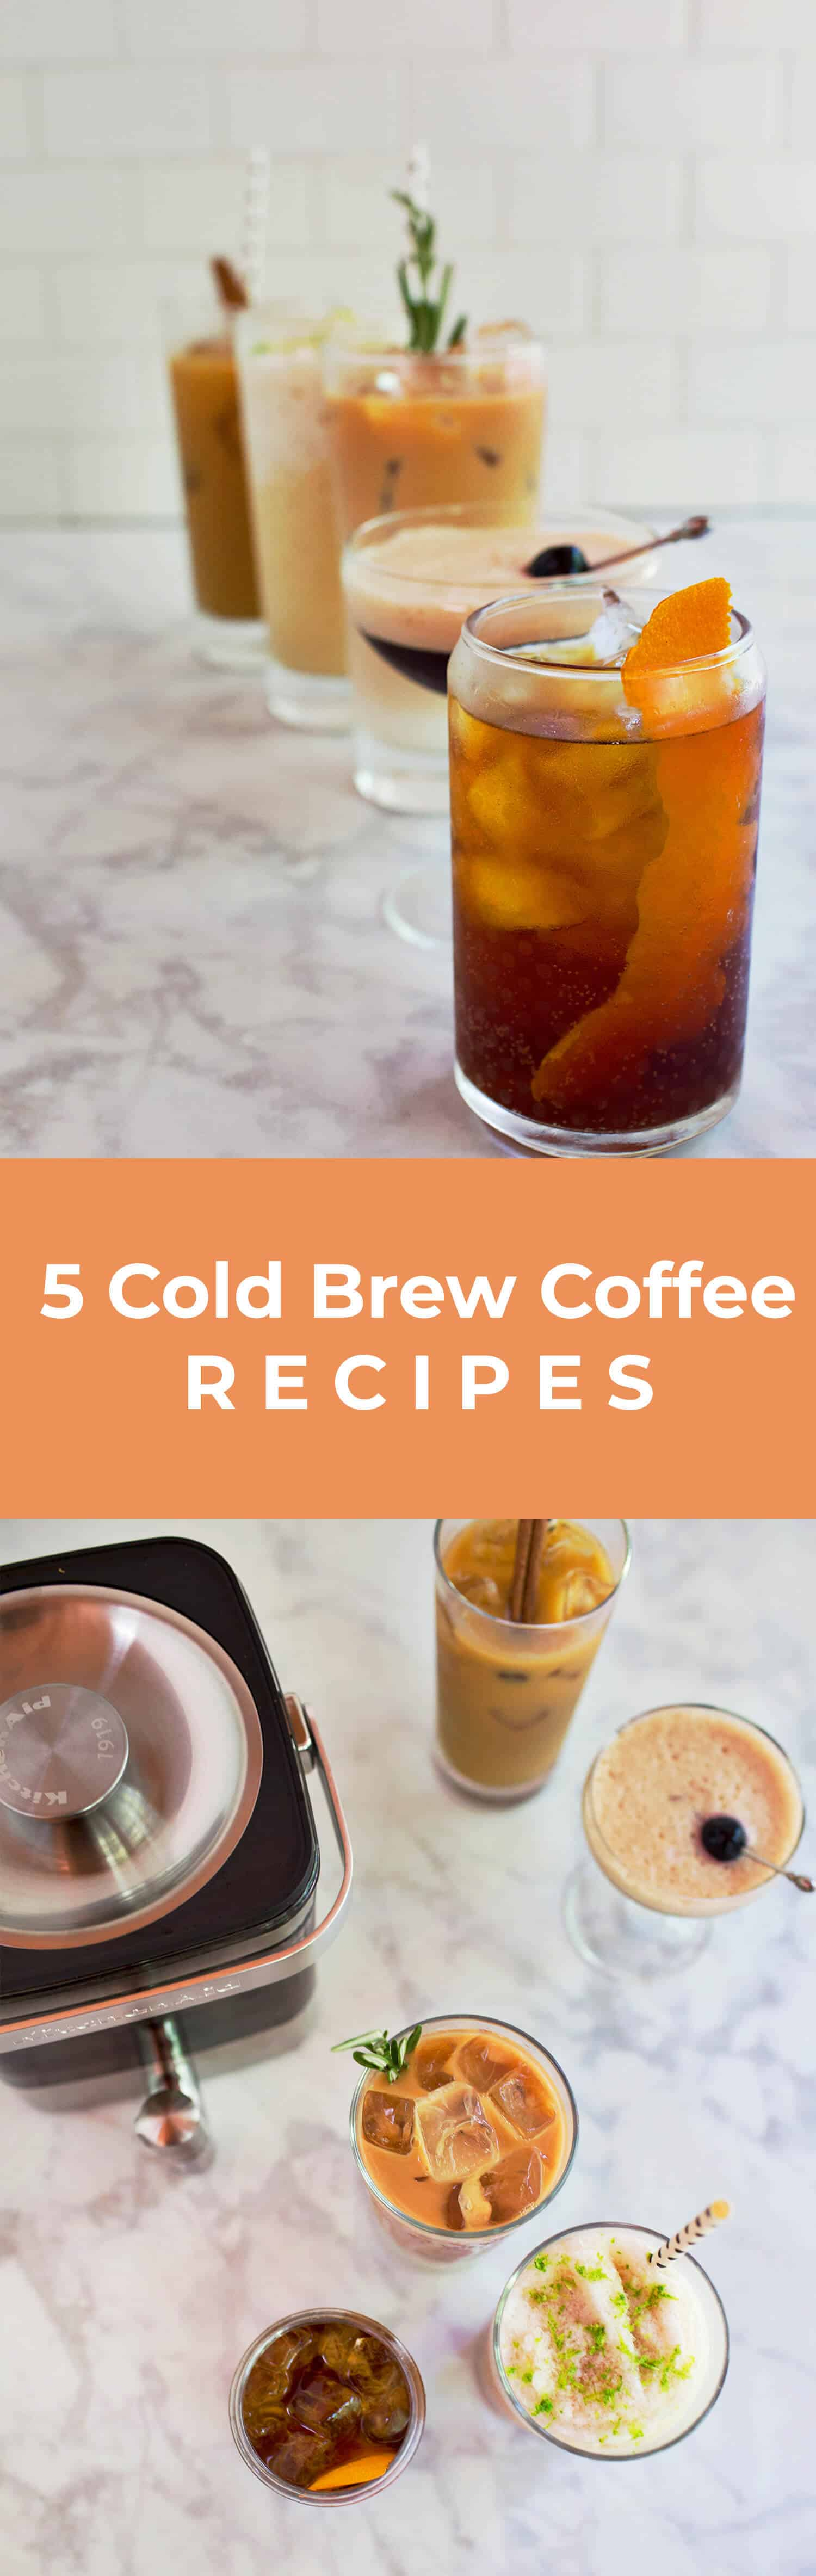 5 kalte Kaffeerezepte